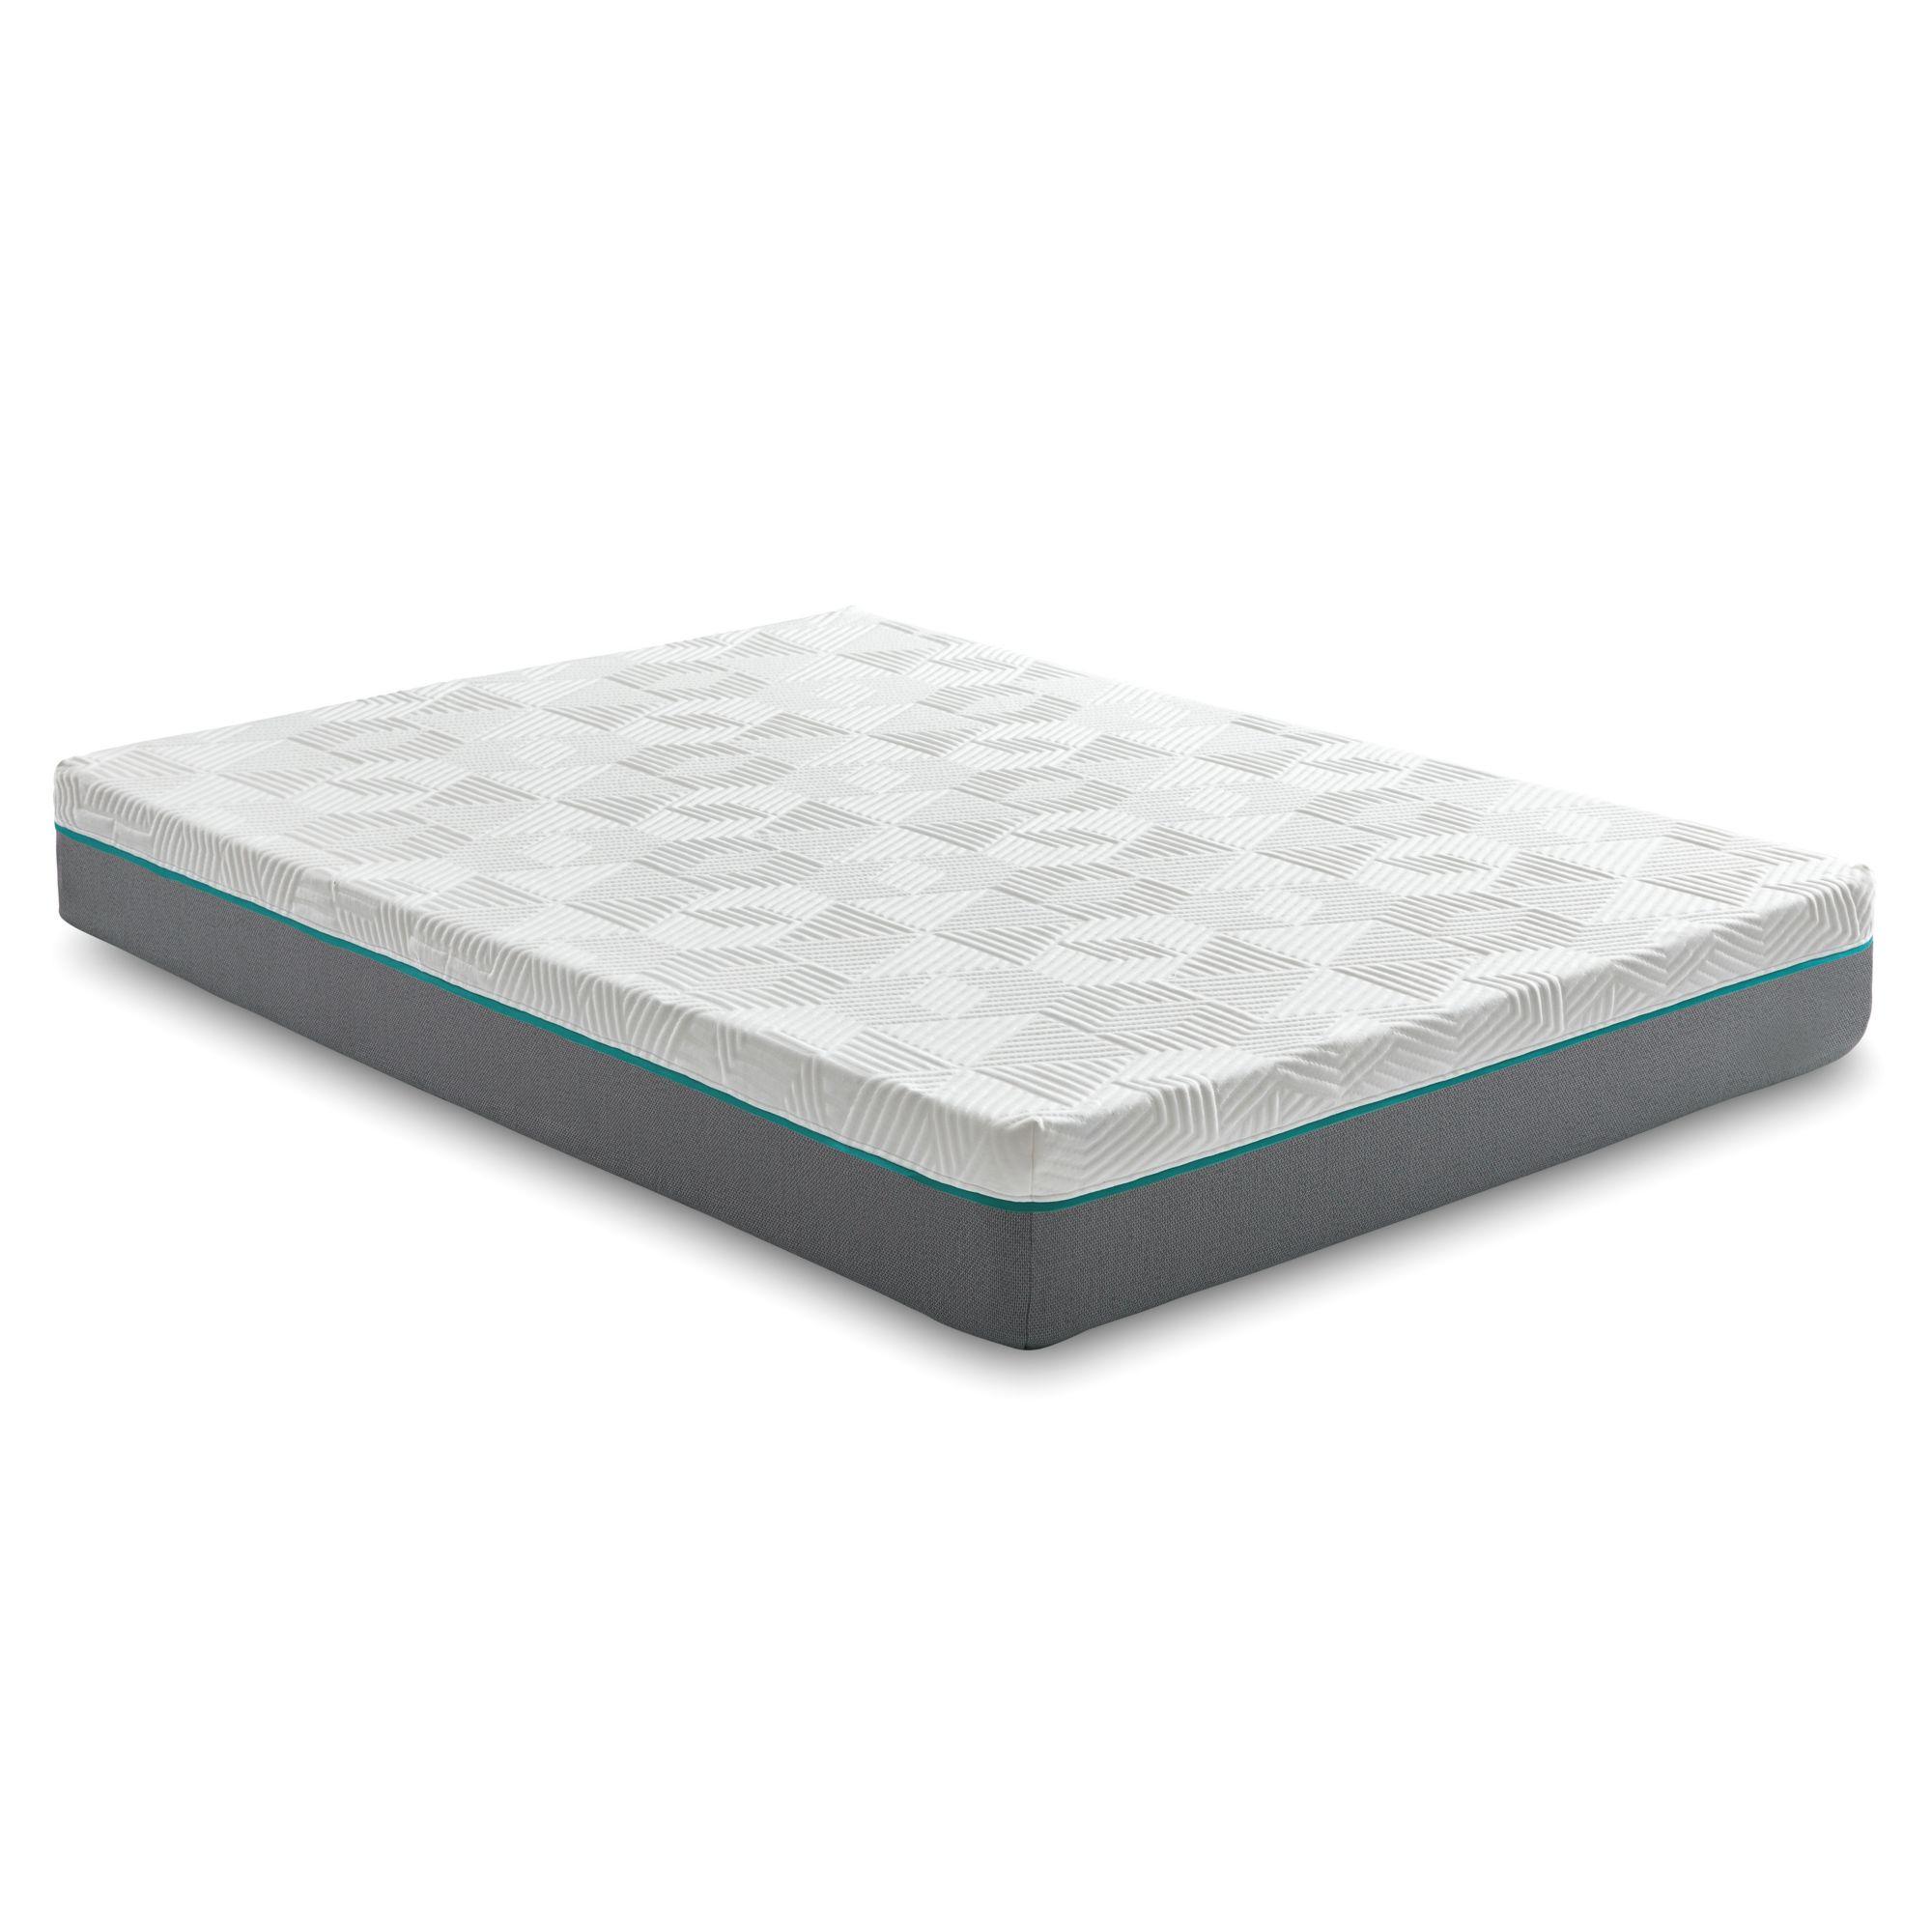 Berkley Jensen Hybrid 10 Full Size Bed In A Box Mattress Bjs Wholesale Club